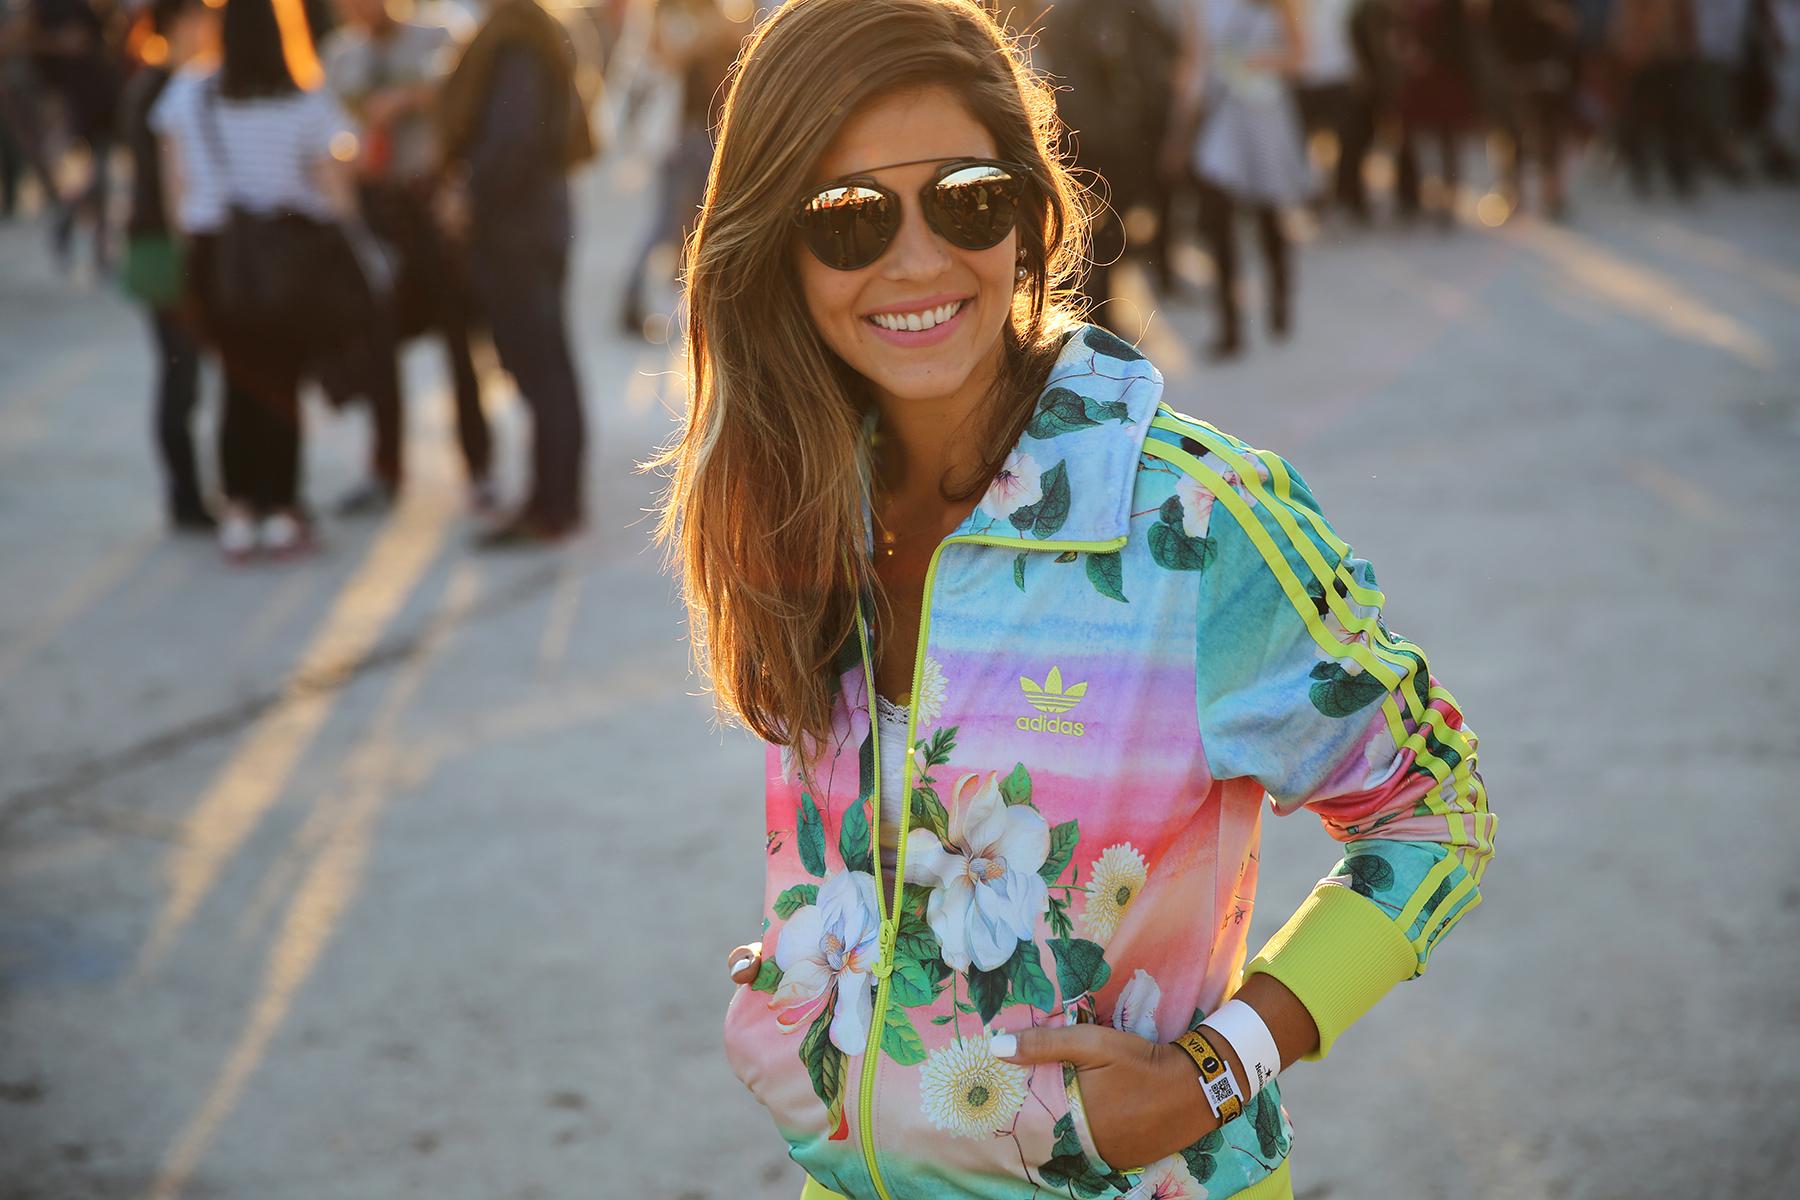 trendy_taste-look-outfit-street_style-ootd-blog-blogger_españa-fashion_spain-moda_españa-festival-primavera_sound-adidas_originals-stan_smith-barcelona-camiseta-zapas-5